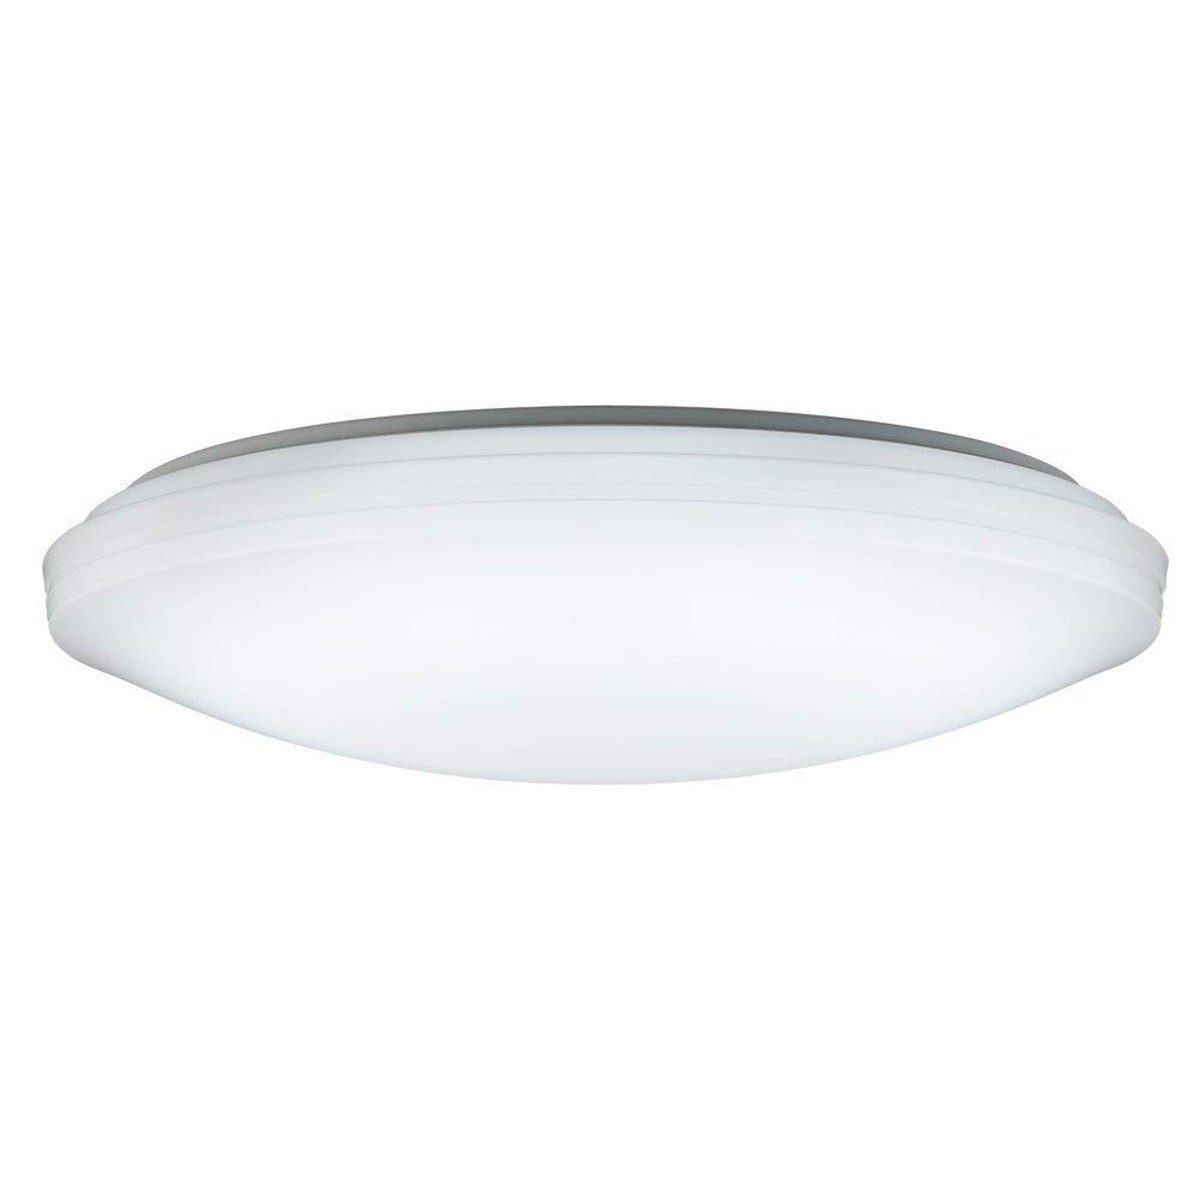 NEC LEDシーリングライト 調色/調光タイプ~6畳 HLDC06208【クーポン配布中】